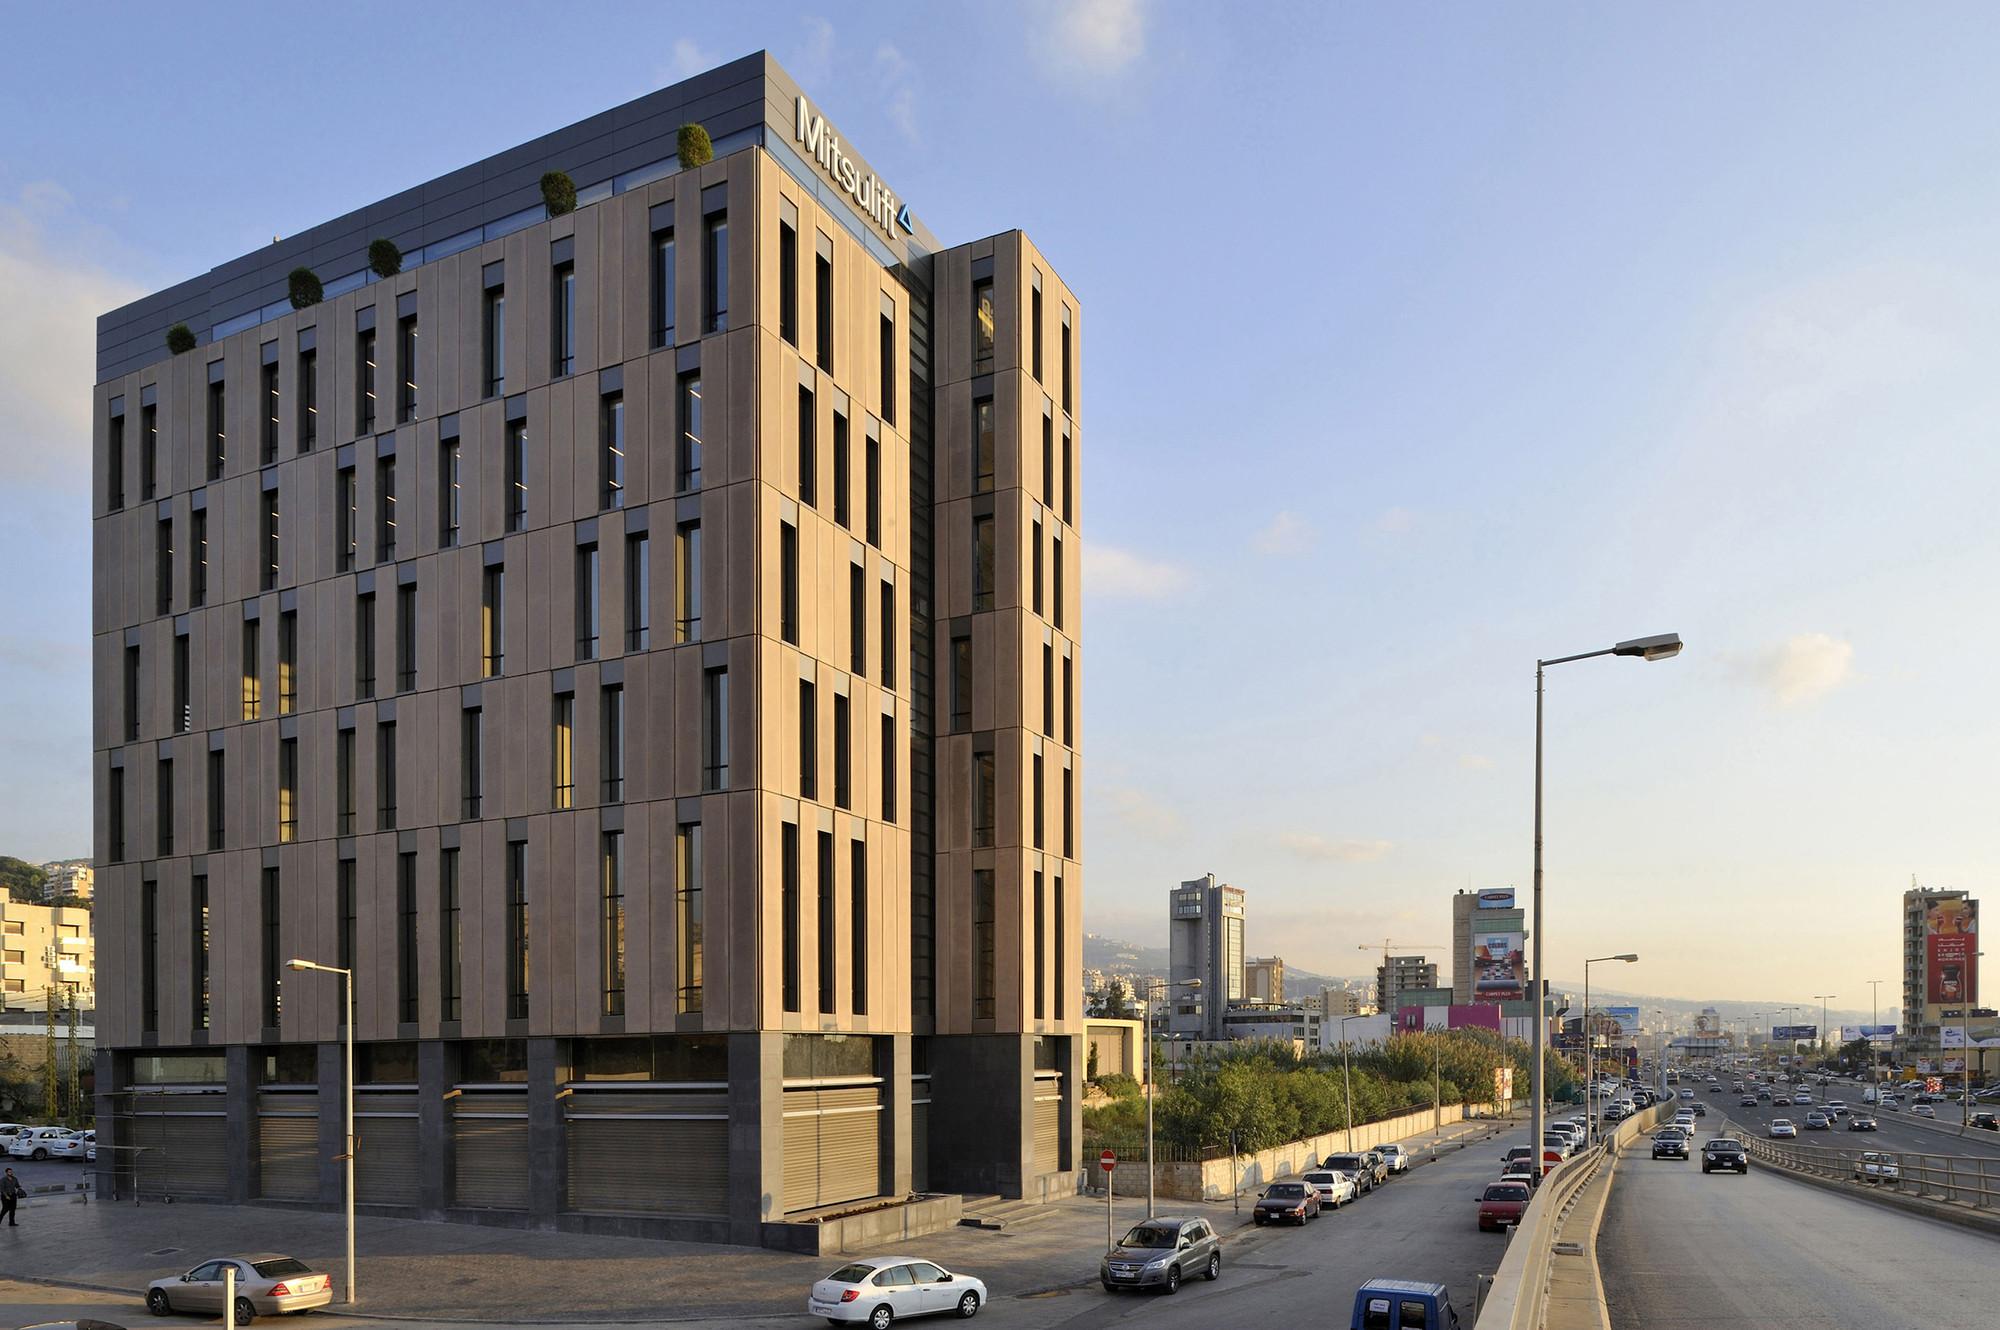 Mitsulift HQ / Raed Abillama Architects, © Géraldine Bruneel